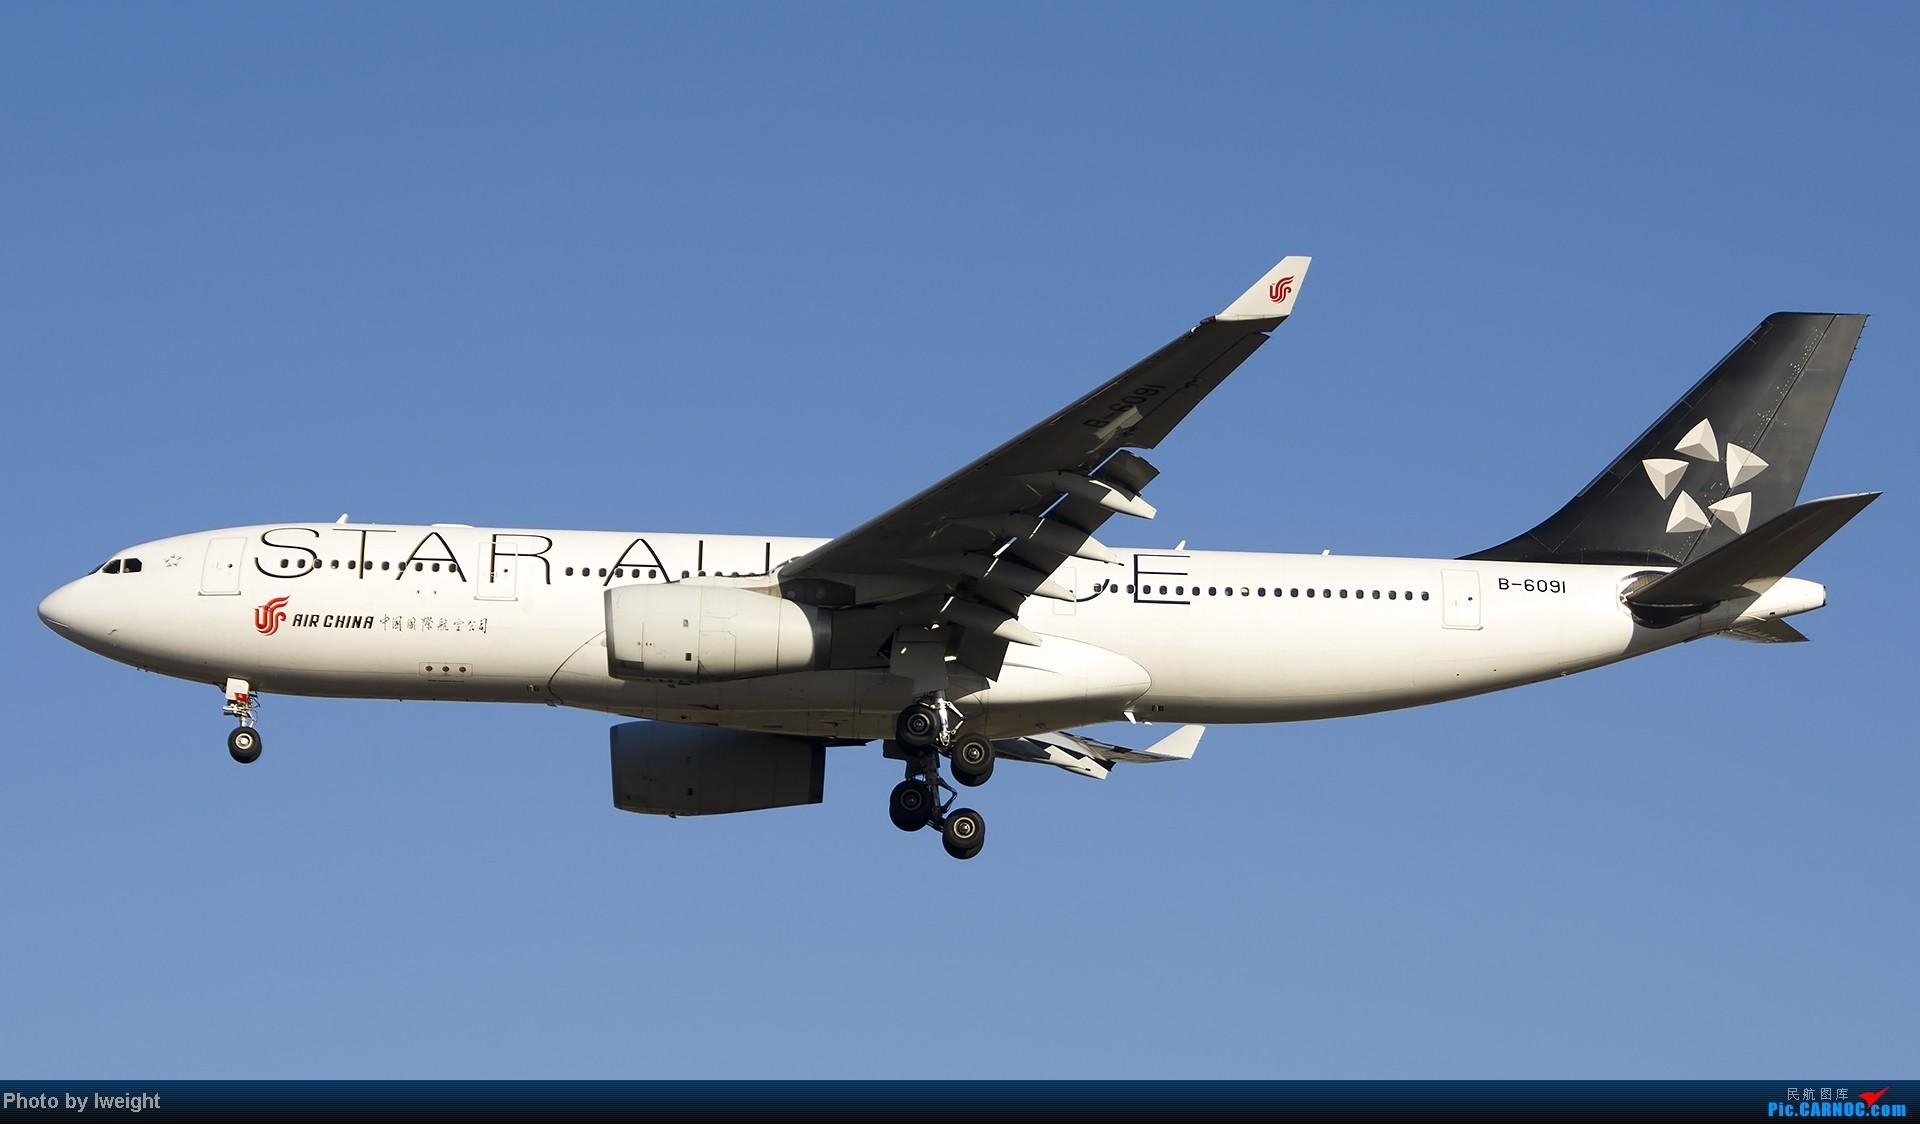 Re:[原创]抓住APEC蓝的尾巴,再拍上一组 AIRBUS A330-200 B-6091 中国北京首都机场